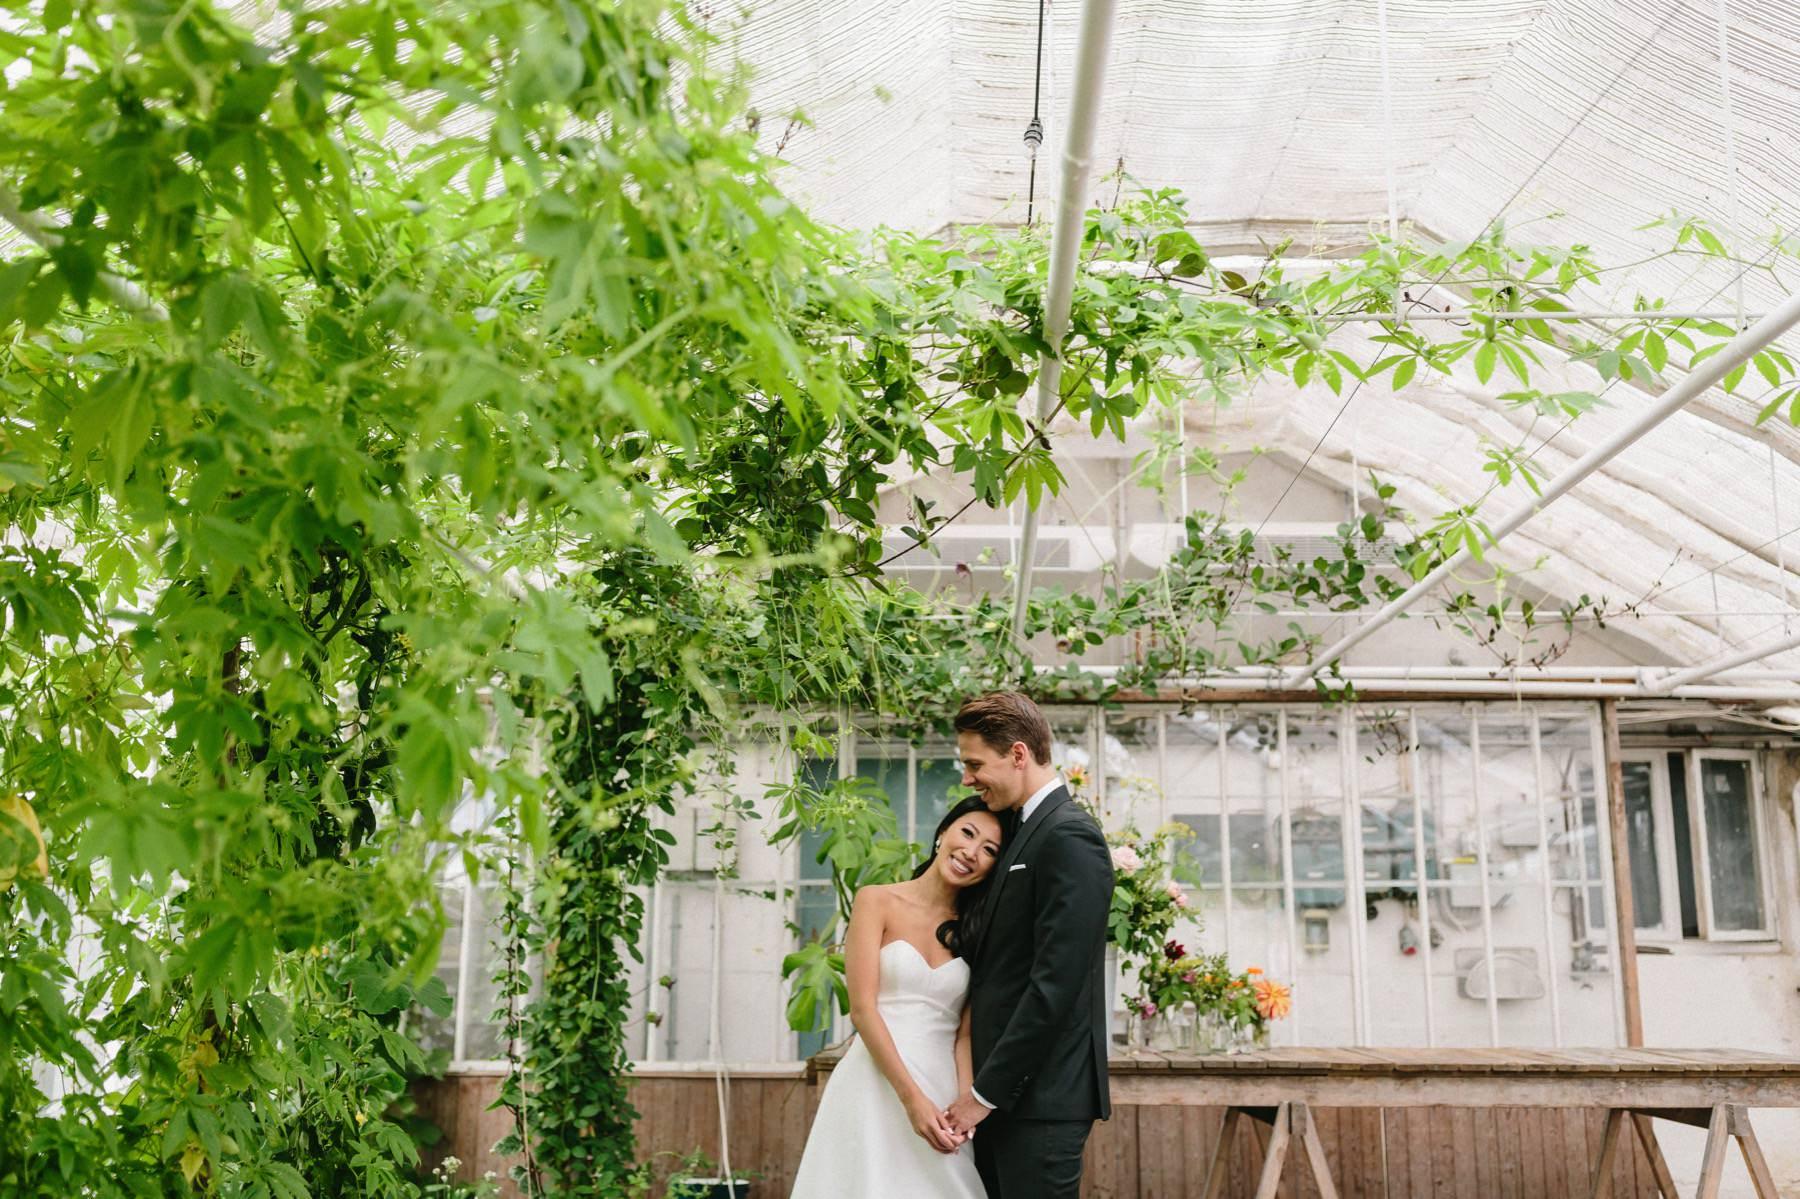 Rosendals Trädgård bröllop